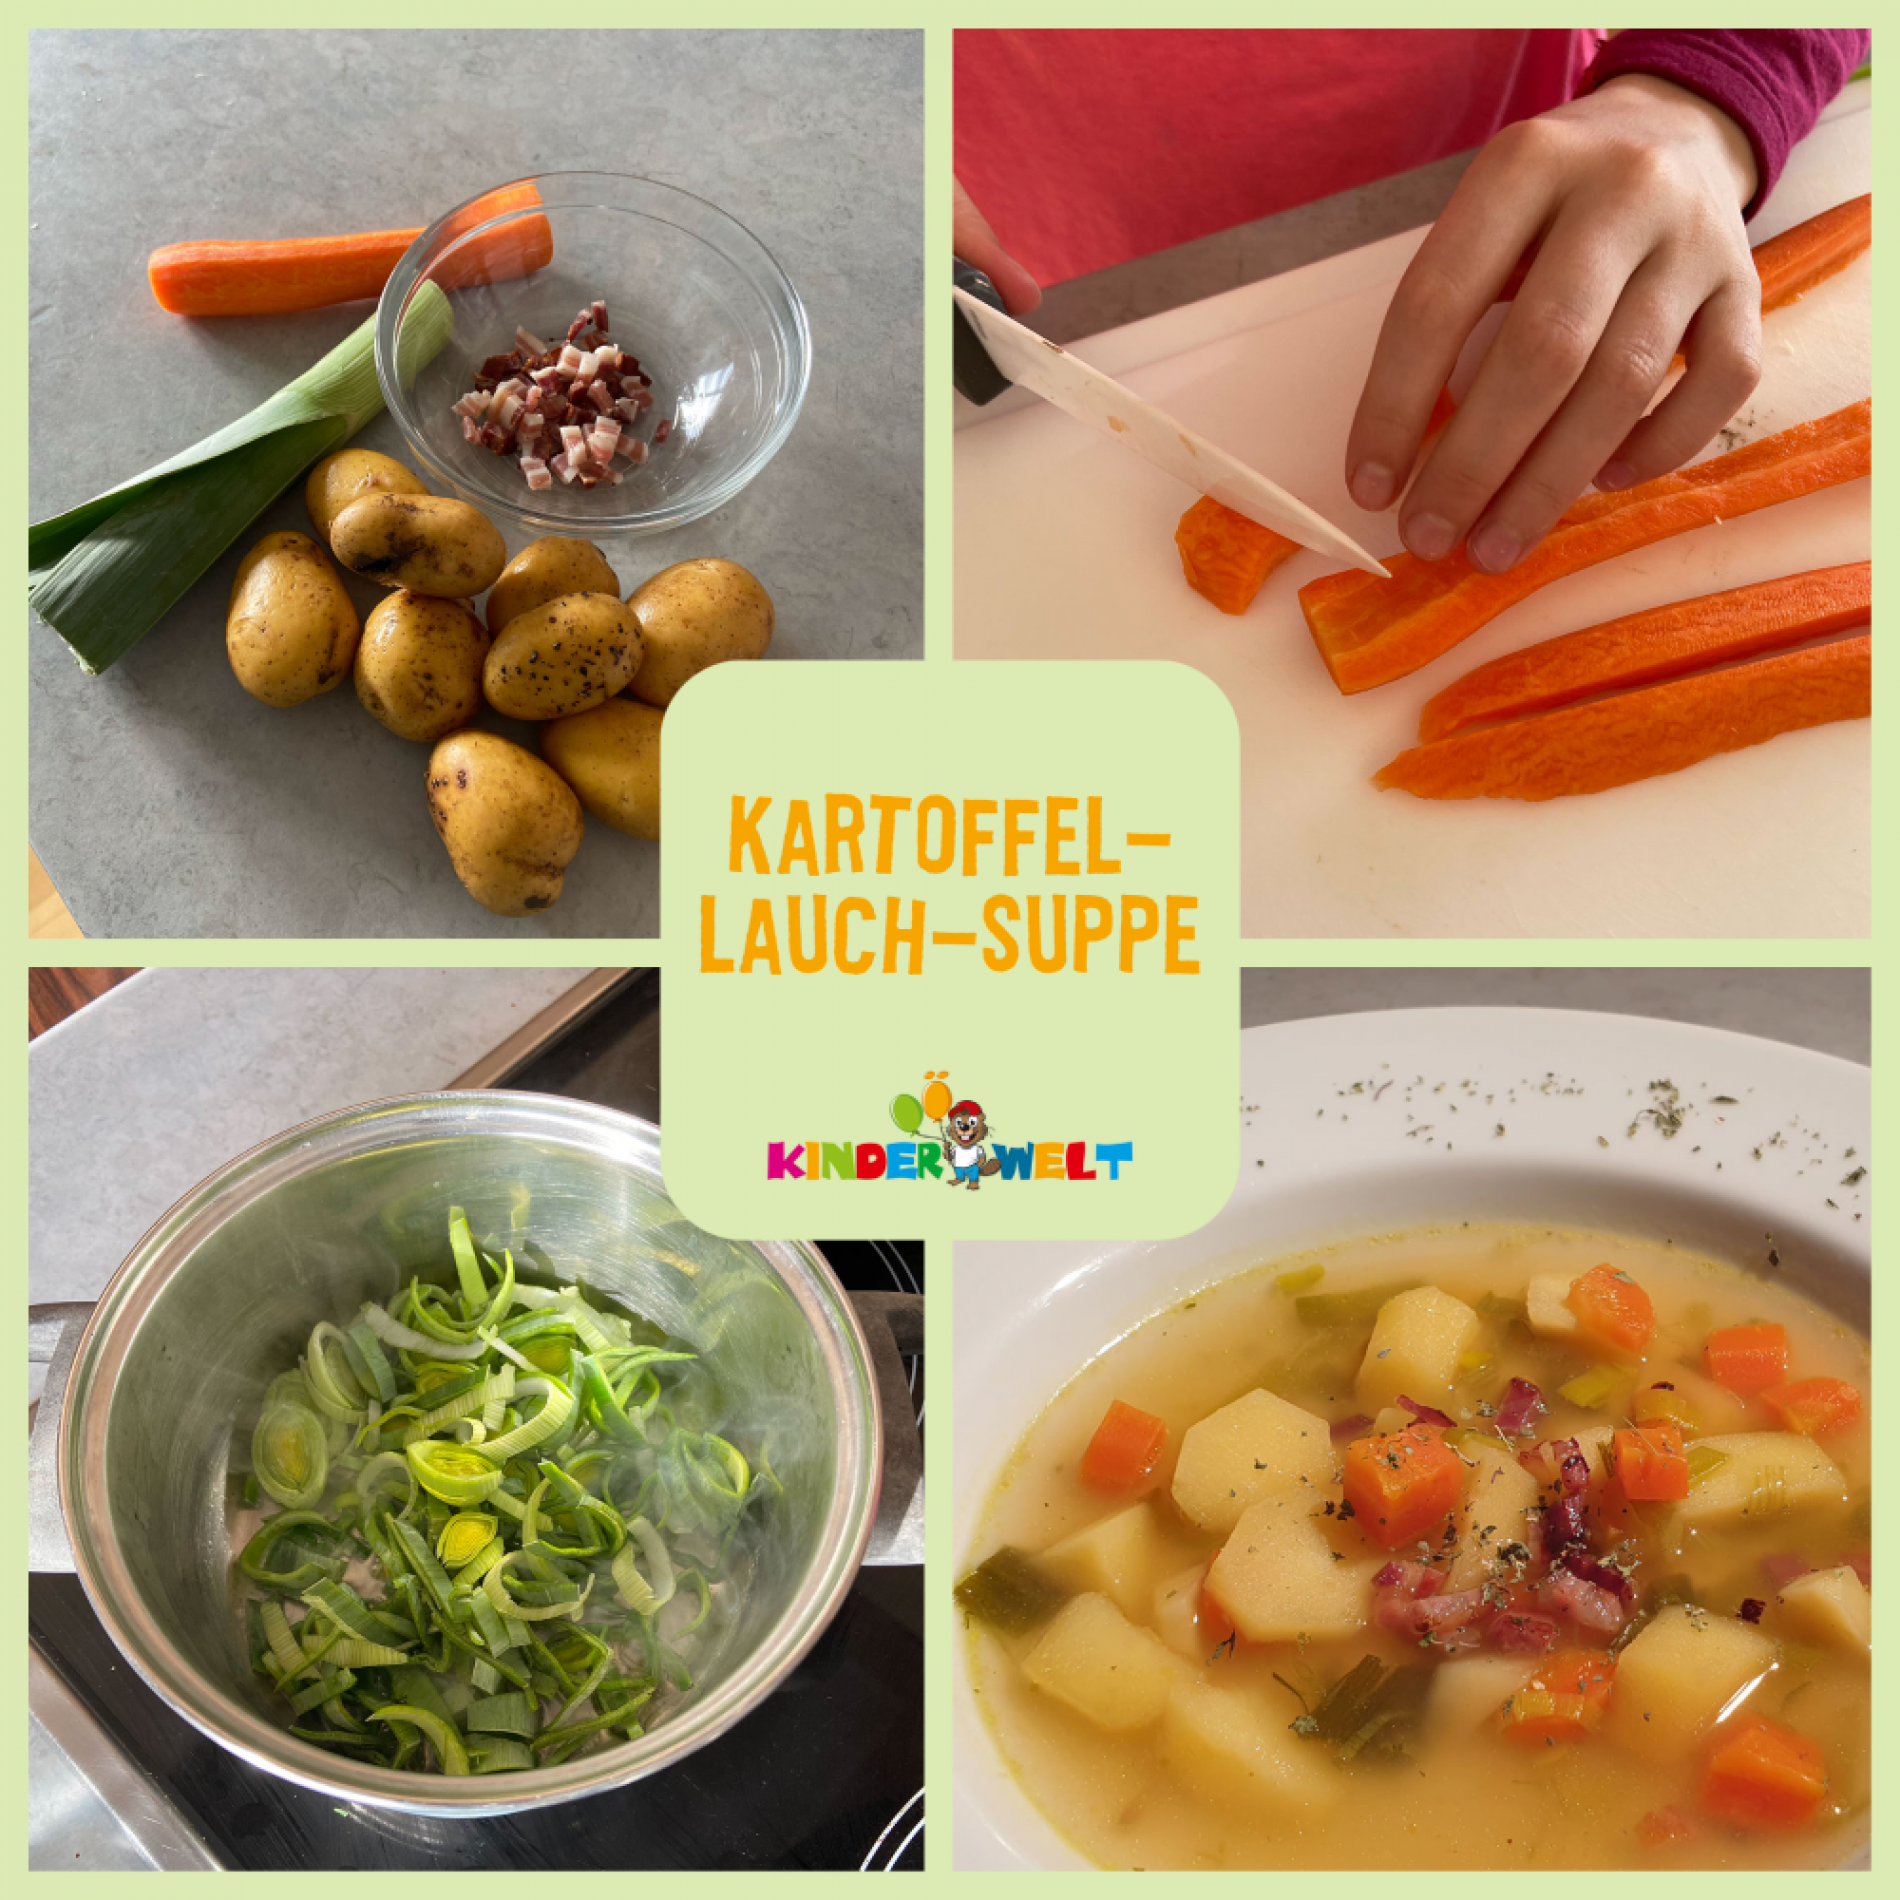 Kartoffel-Lauch-Suppe-Post